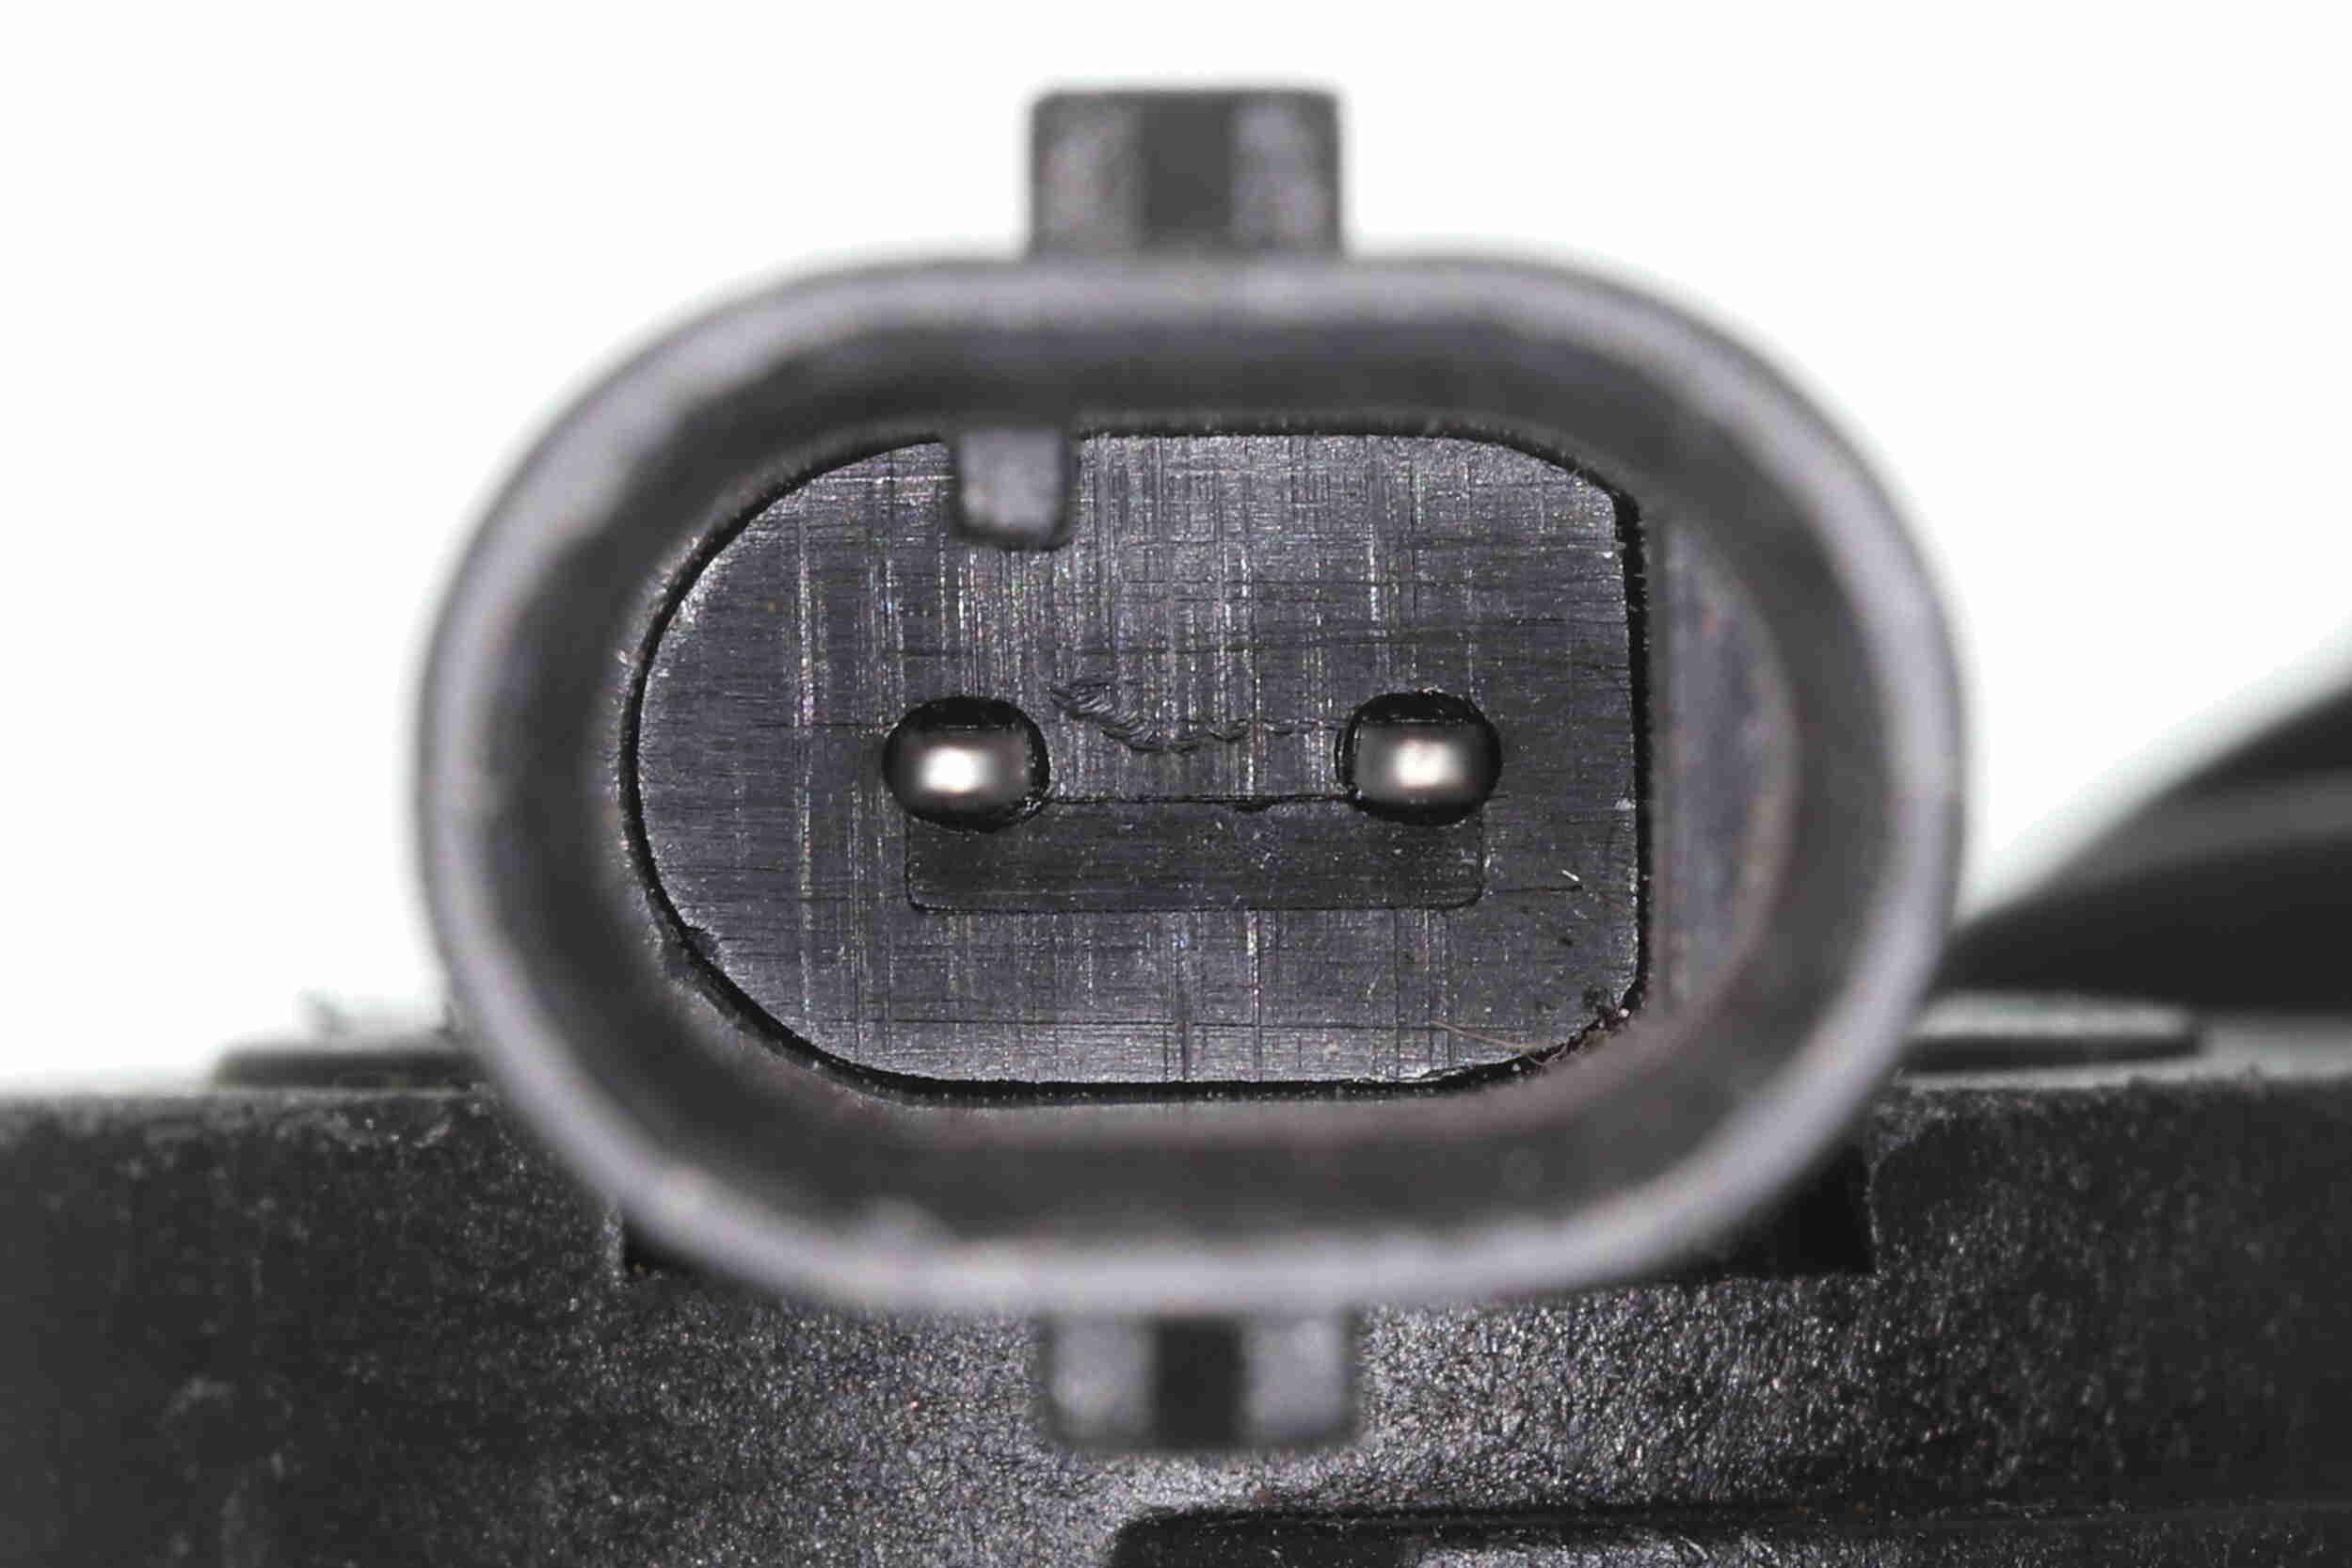 V30990198 Kühlwasserthermostat VEMO V30-99-0198 - Große Auswahl - stark reduziert